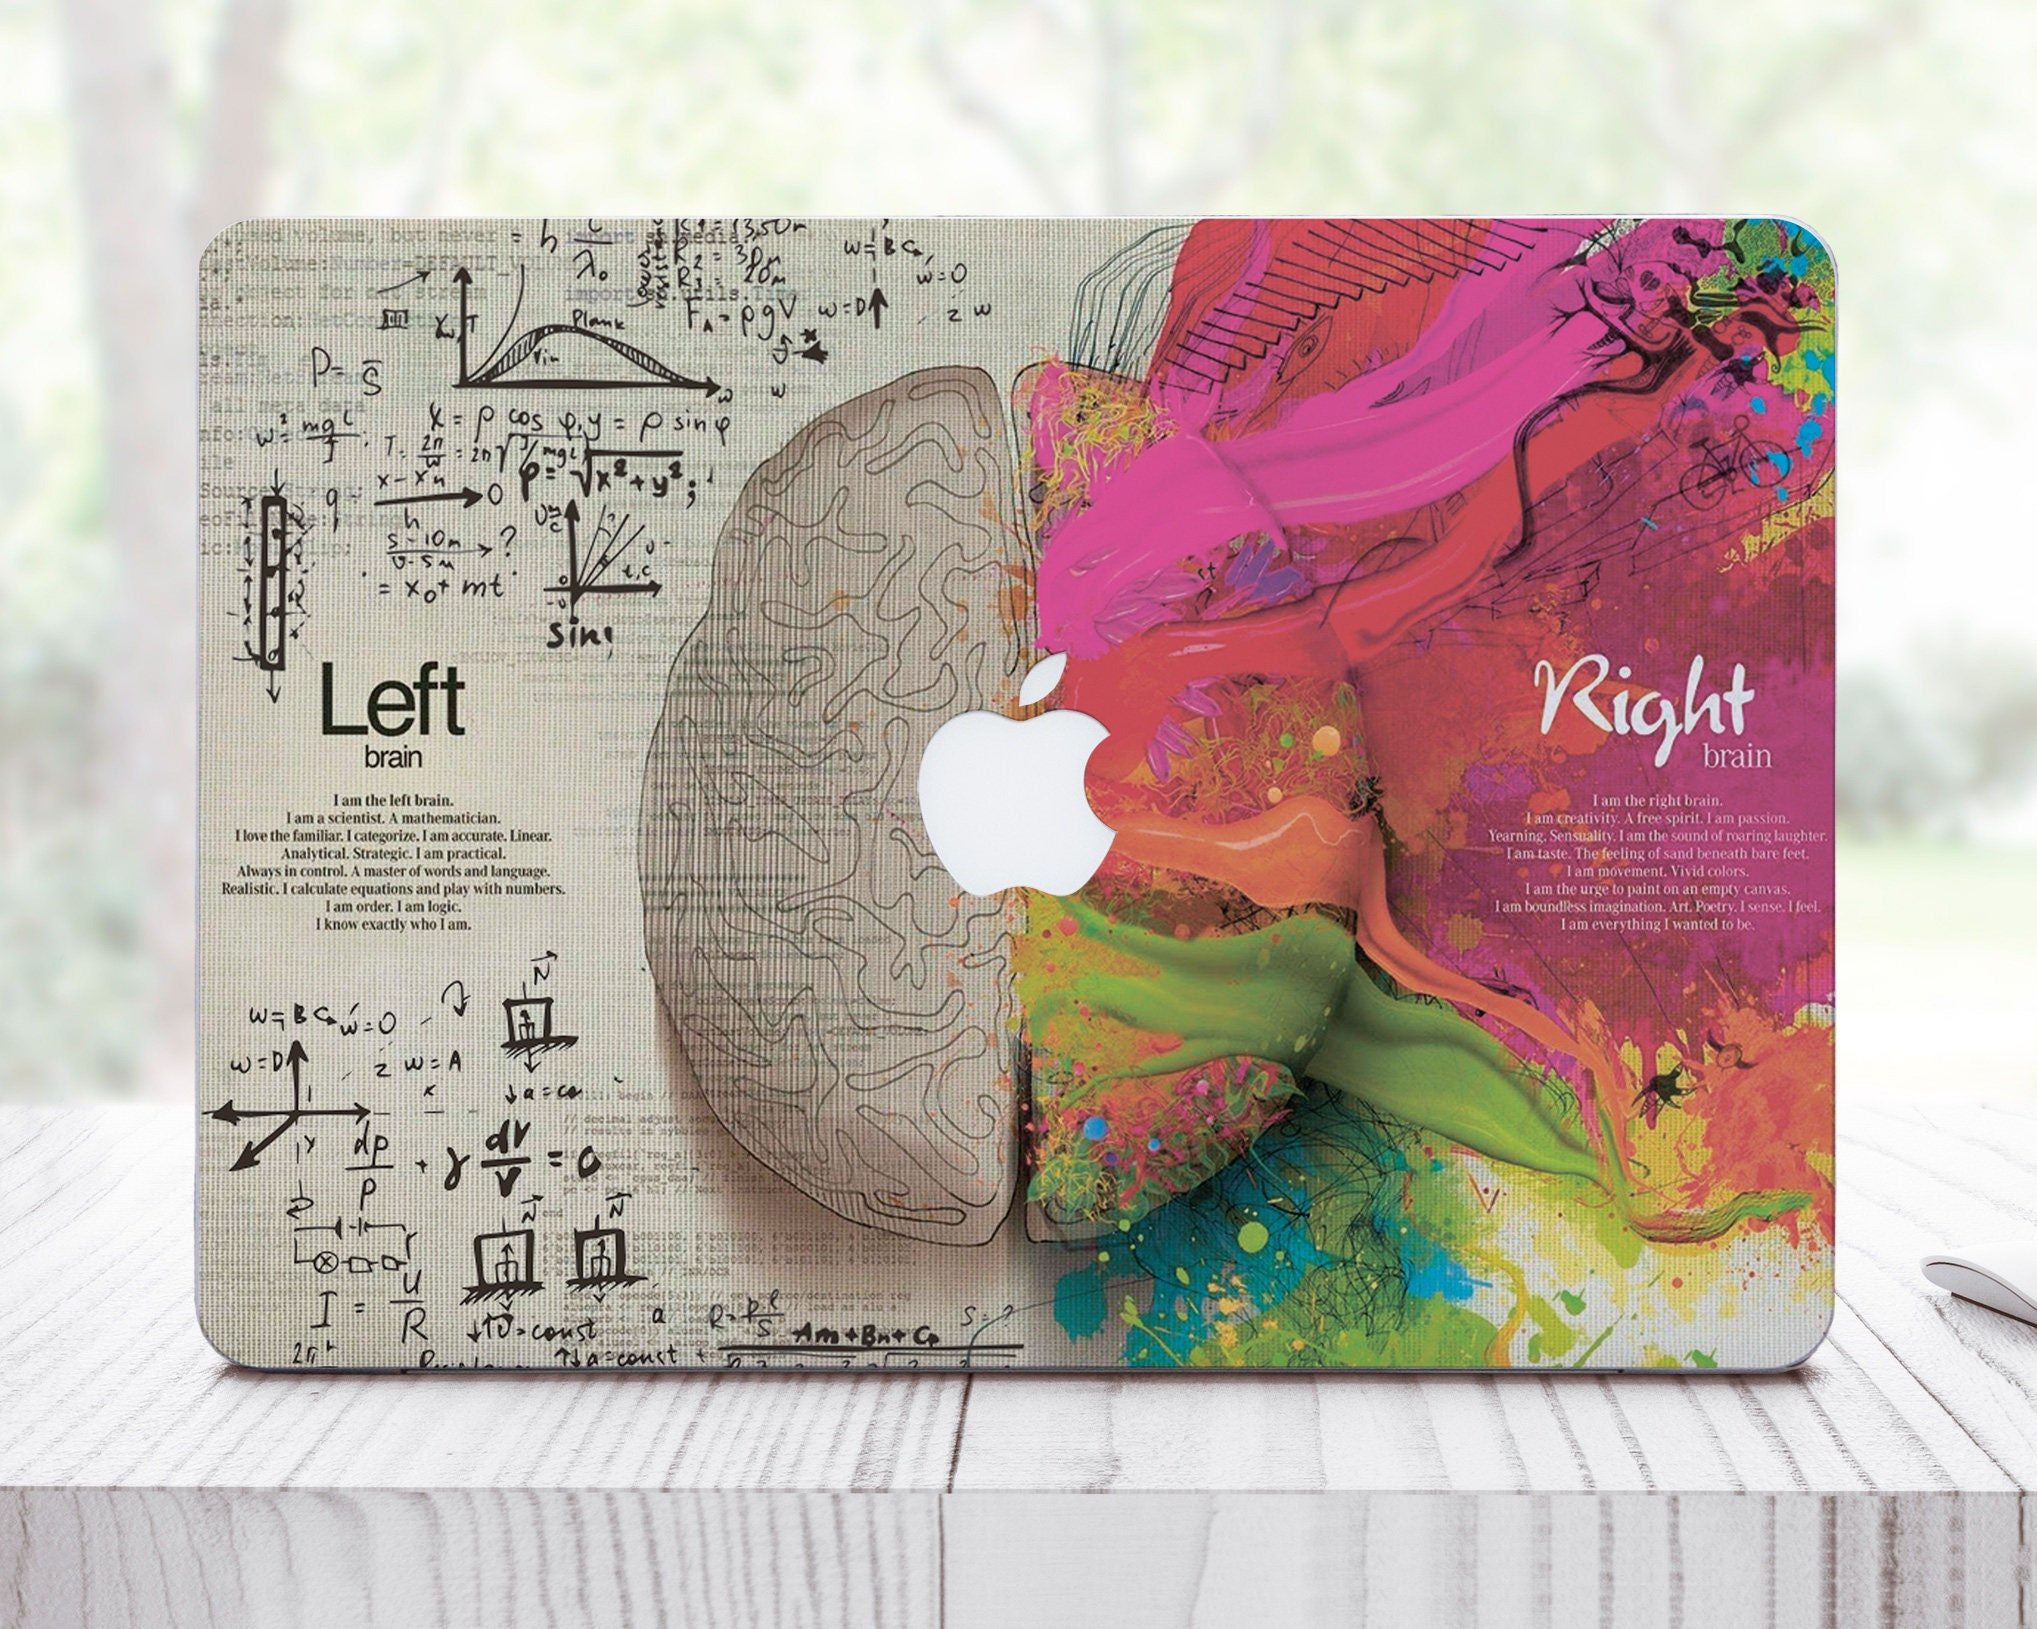 Brain Pro Retina 15 Vinyl Sticker Laptop Case For Mac Air 13 MacBook Pro 15 2016 Skin HP Skin For Dell Asus Decal Macbook Skin ES0048